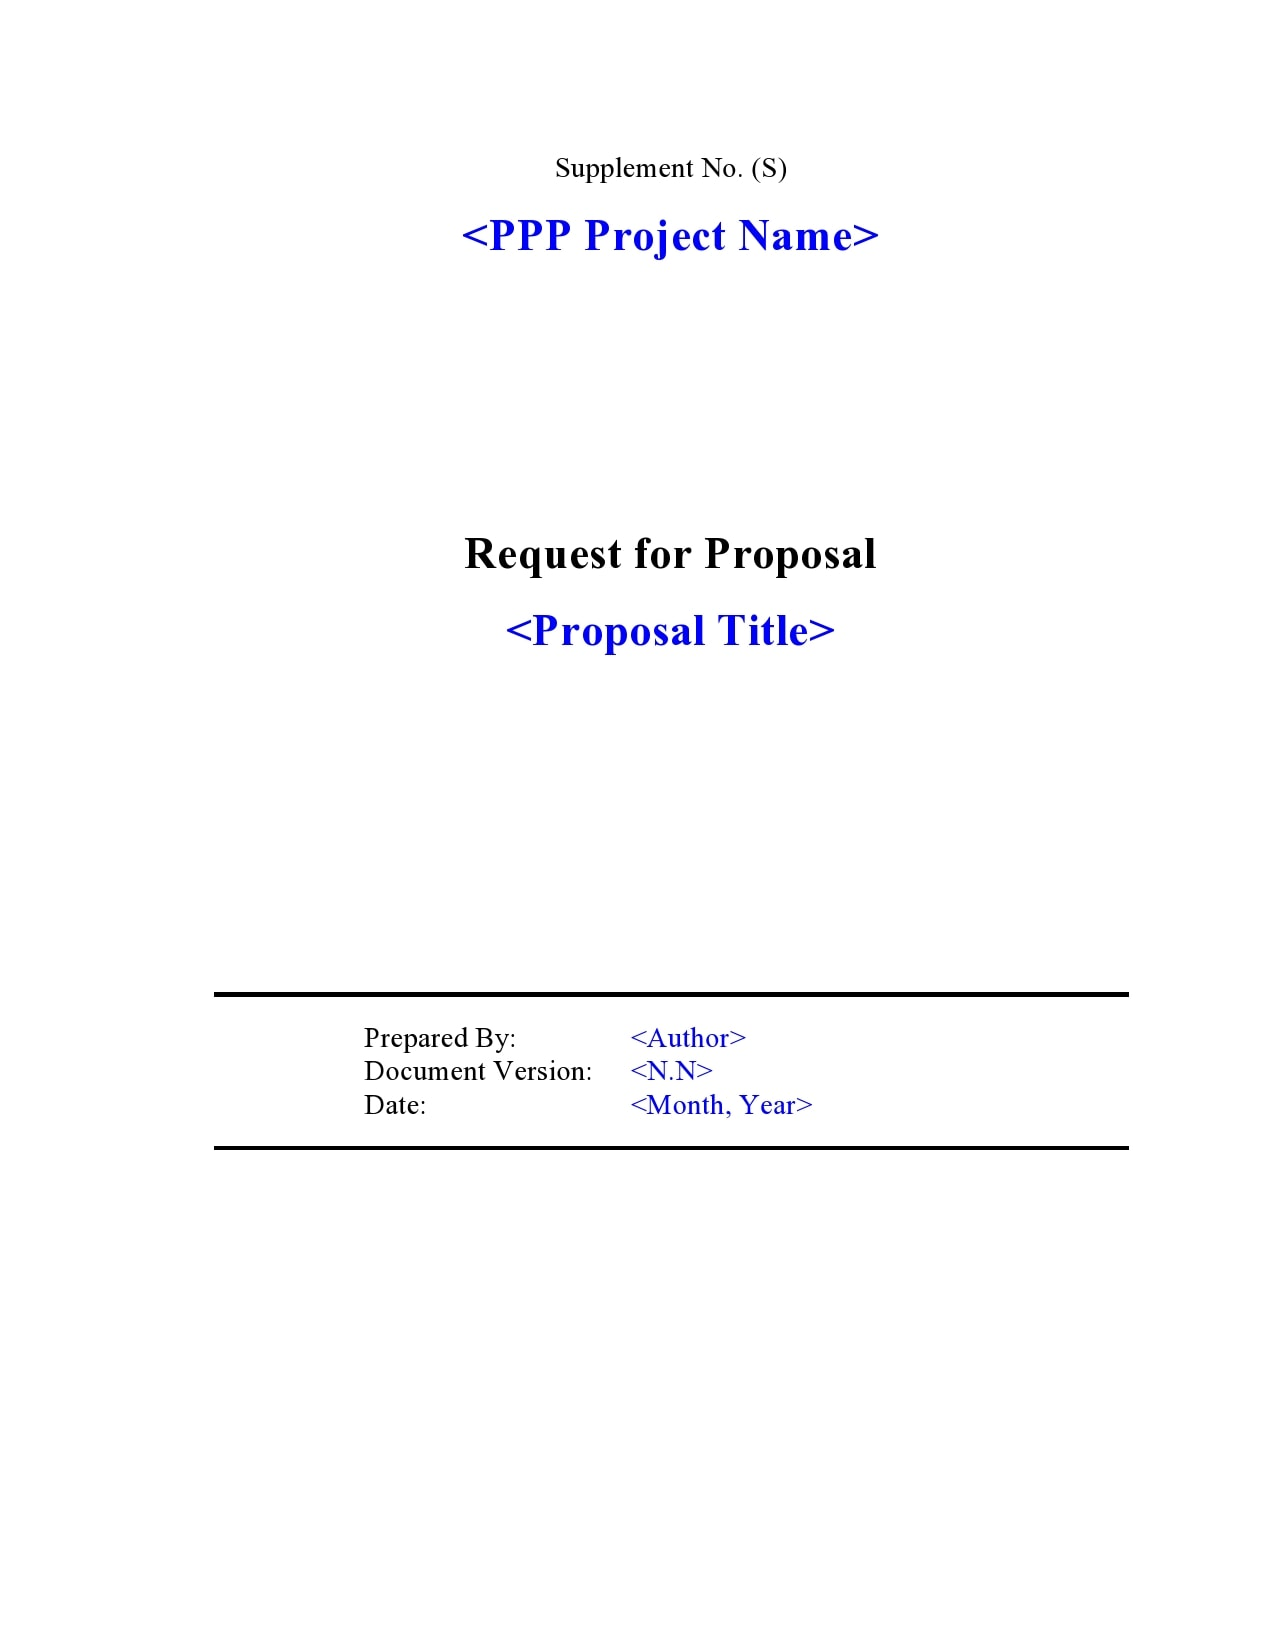 rfp template 04